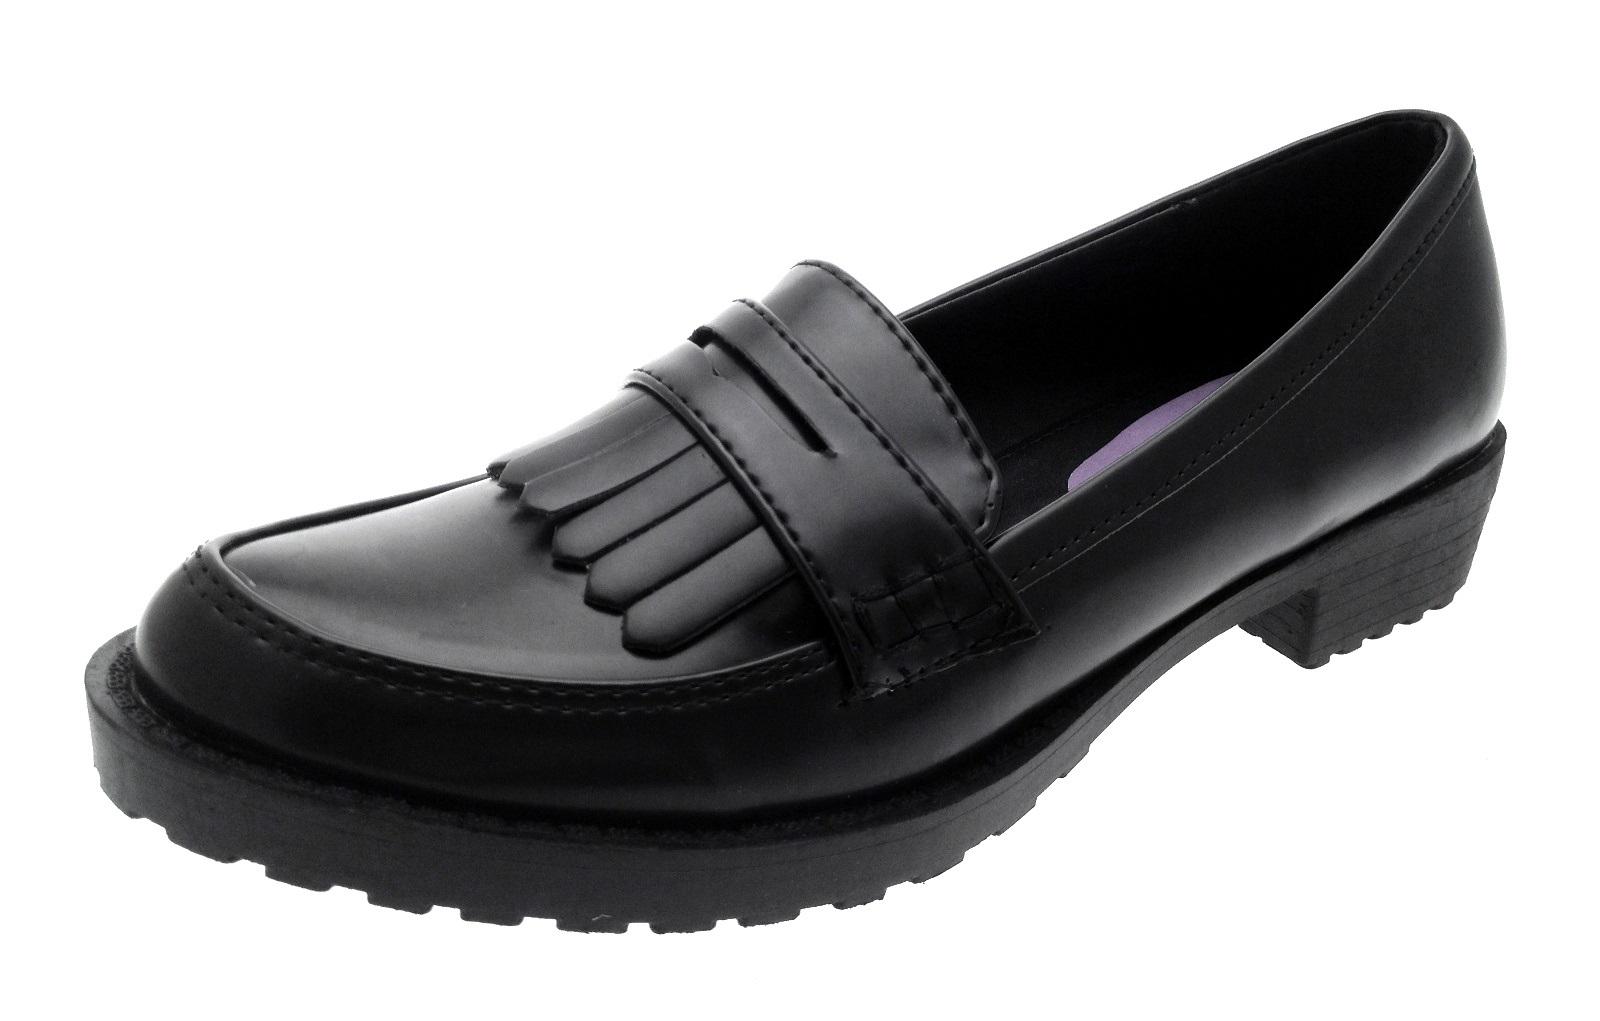 1c7326d3ee1e Kids Girls Black Faux Leather School Shoes Childrens Smart Casual ...